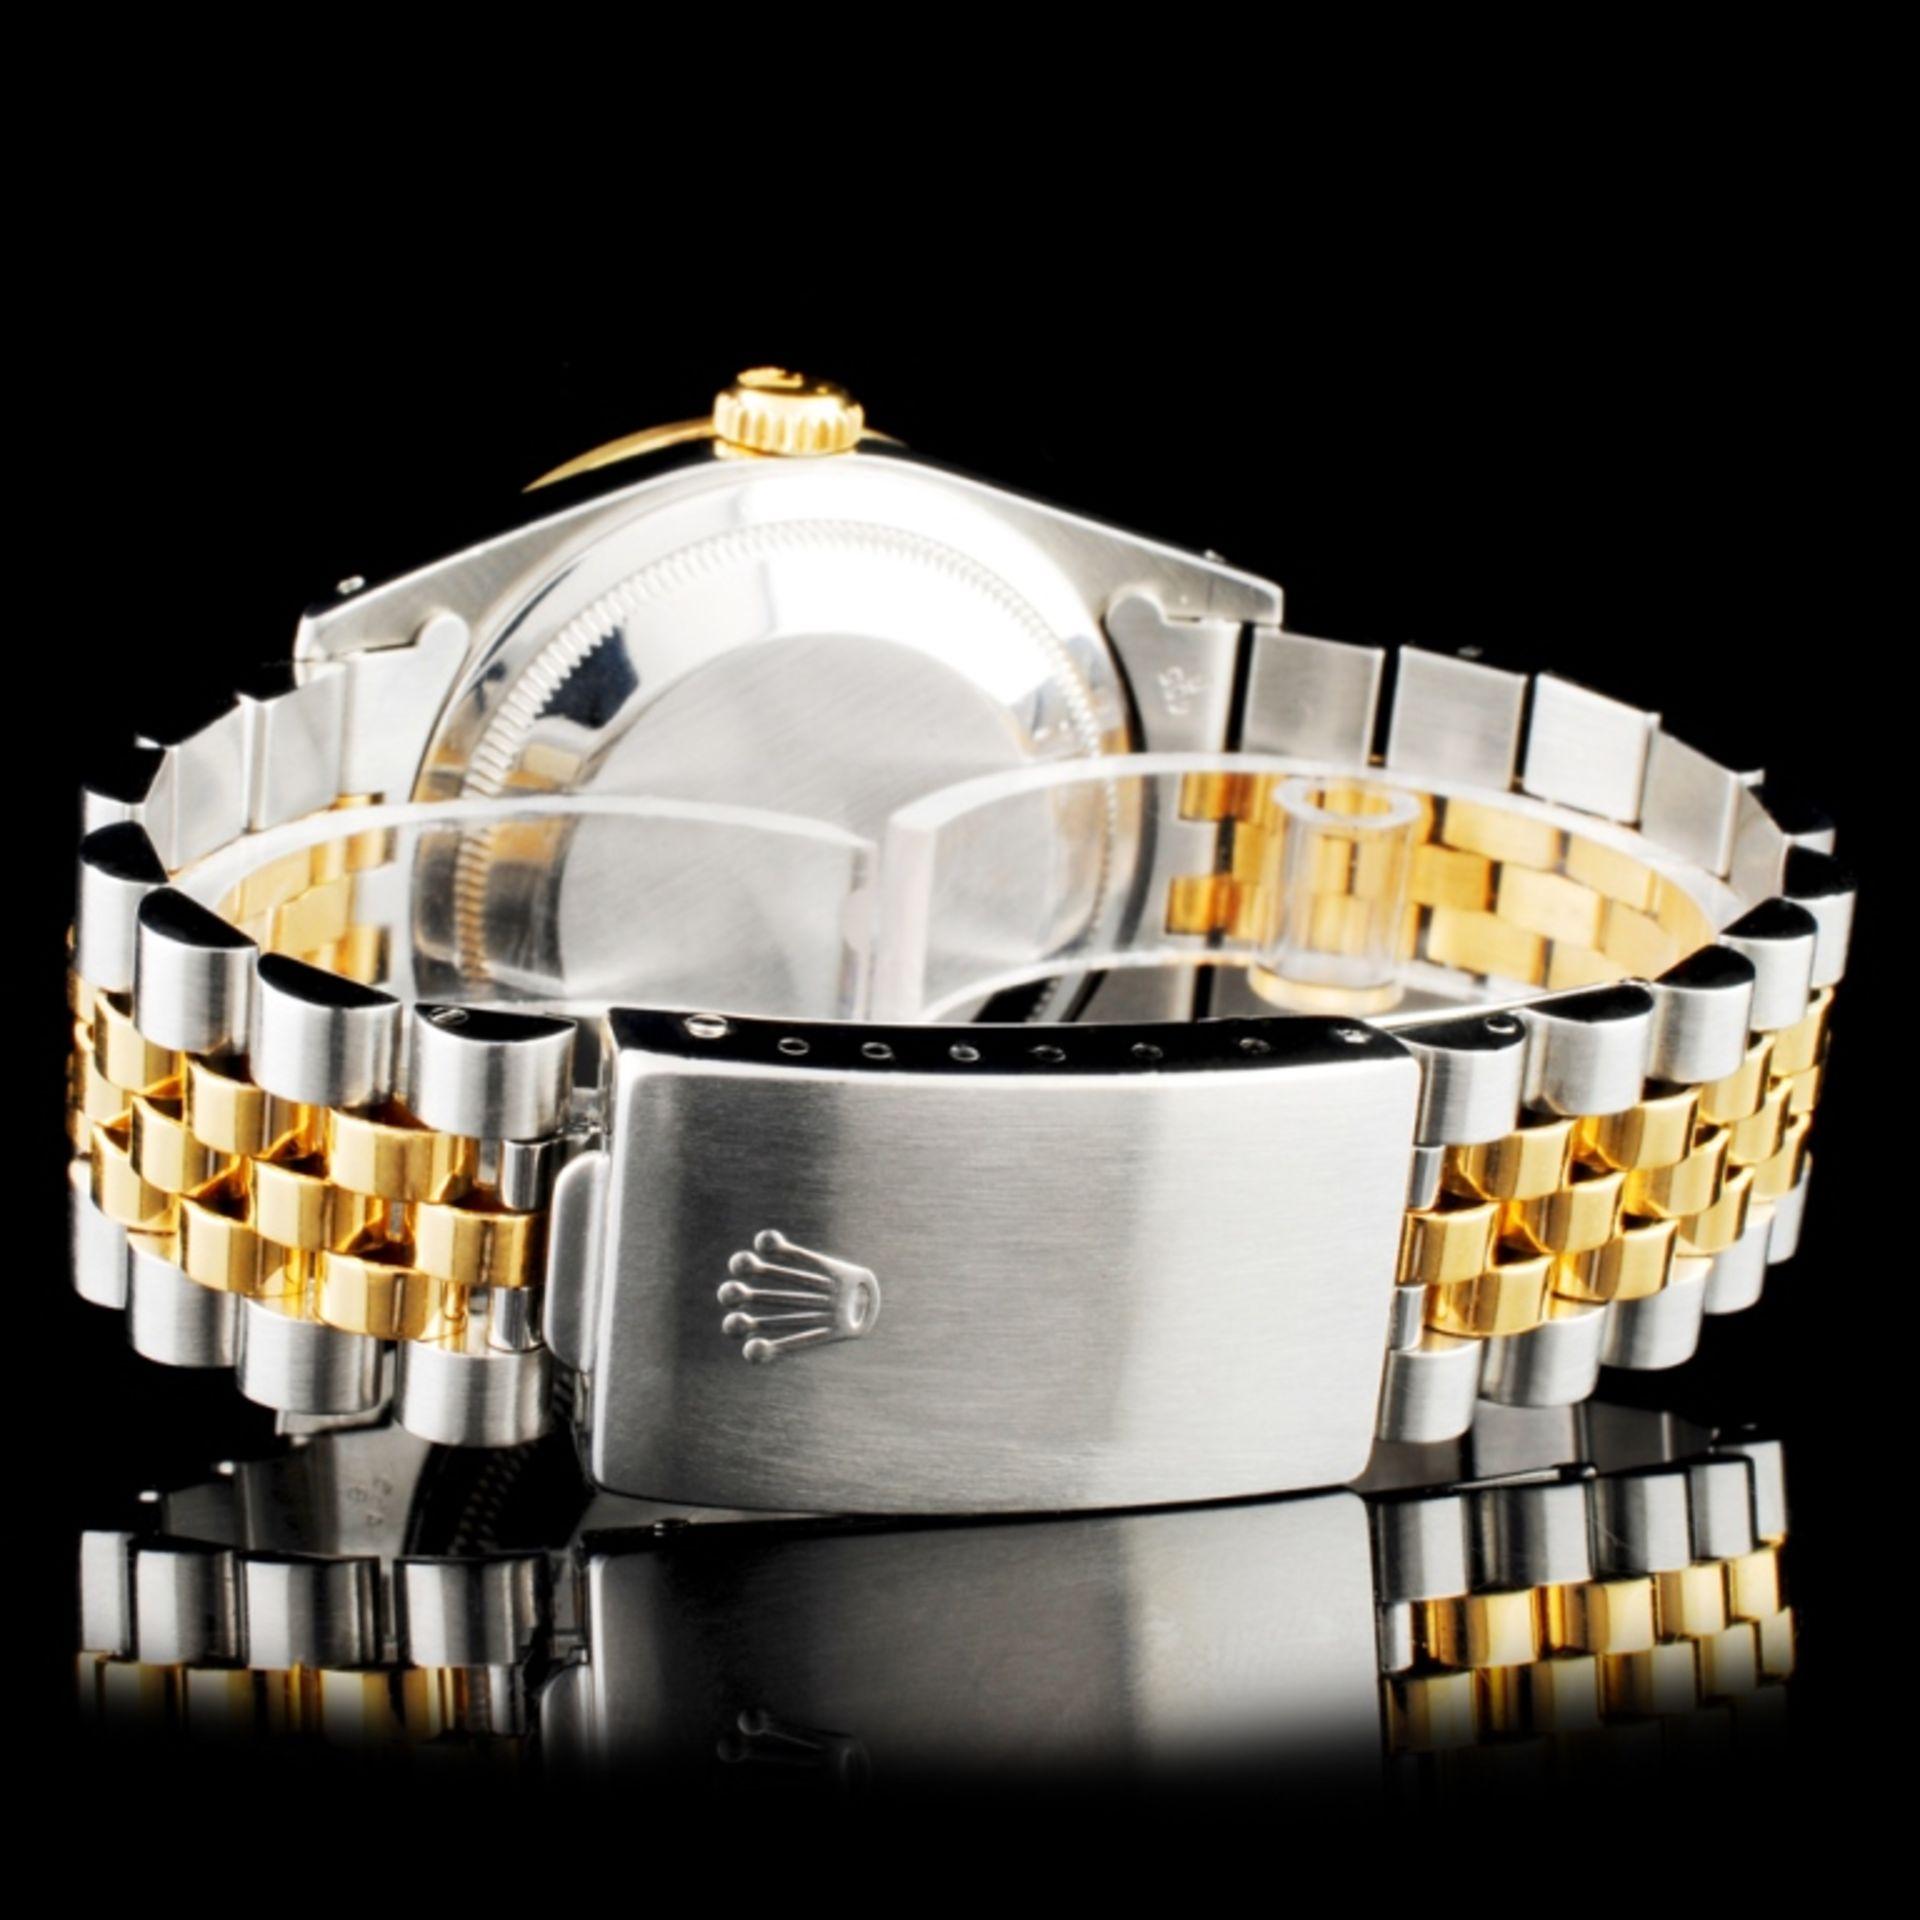 Rolex DateJust Diamond 36MM Wristwatch - Image 4 of 6